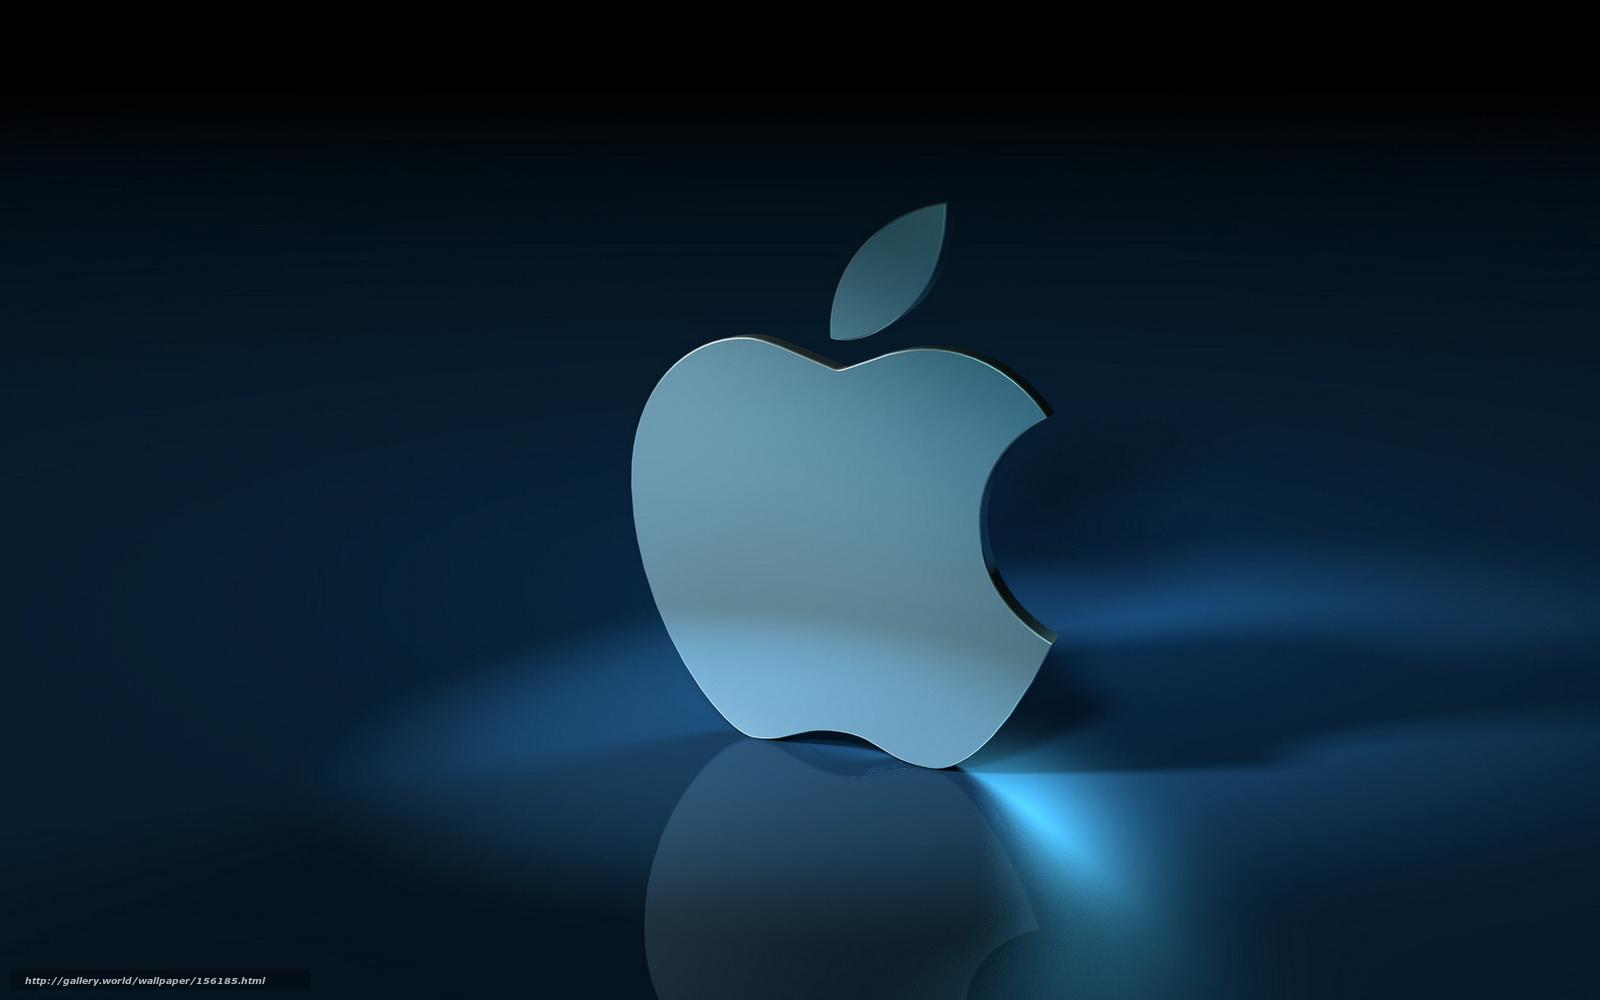 Apple logo 3d wallpaper 740697 - Original apple logo wallpaper ...